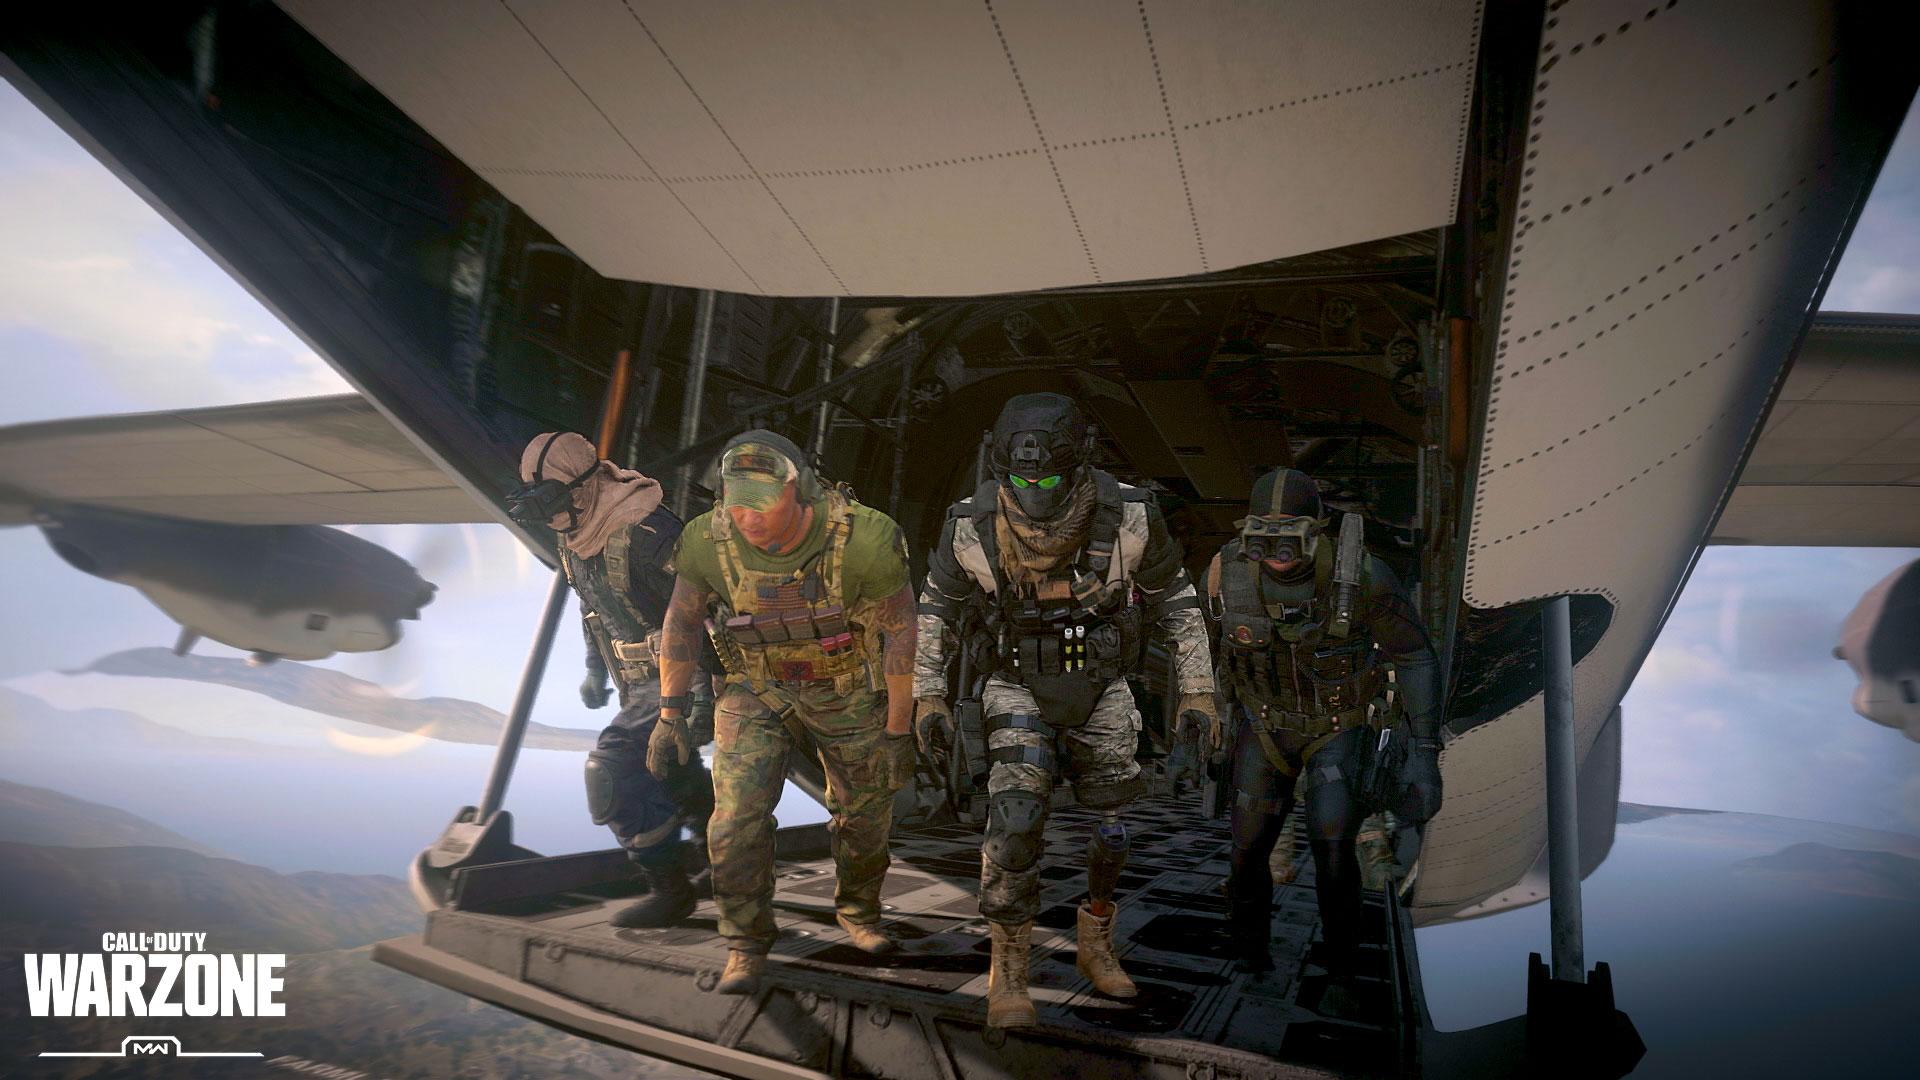 Call Of Duty Modern Warfare Season 3 Introduces Warzone Quads